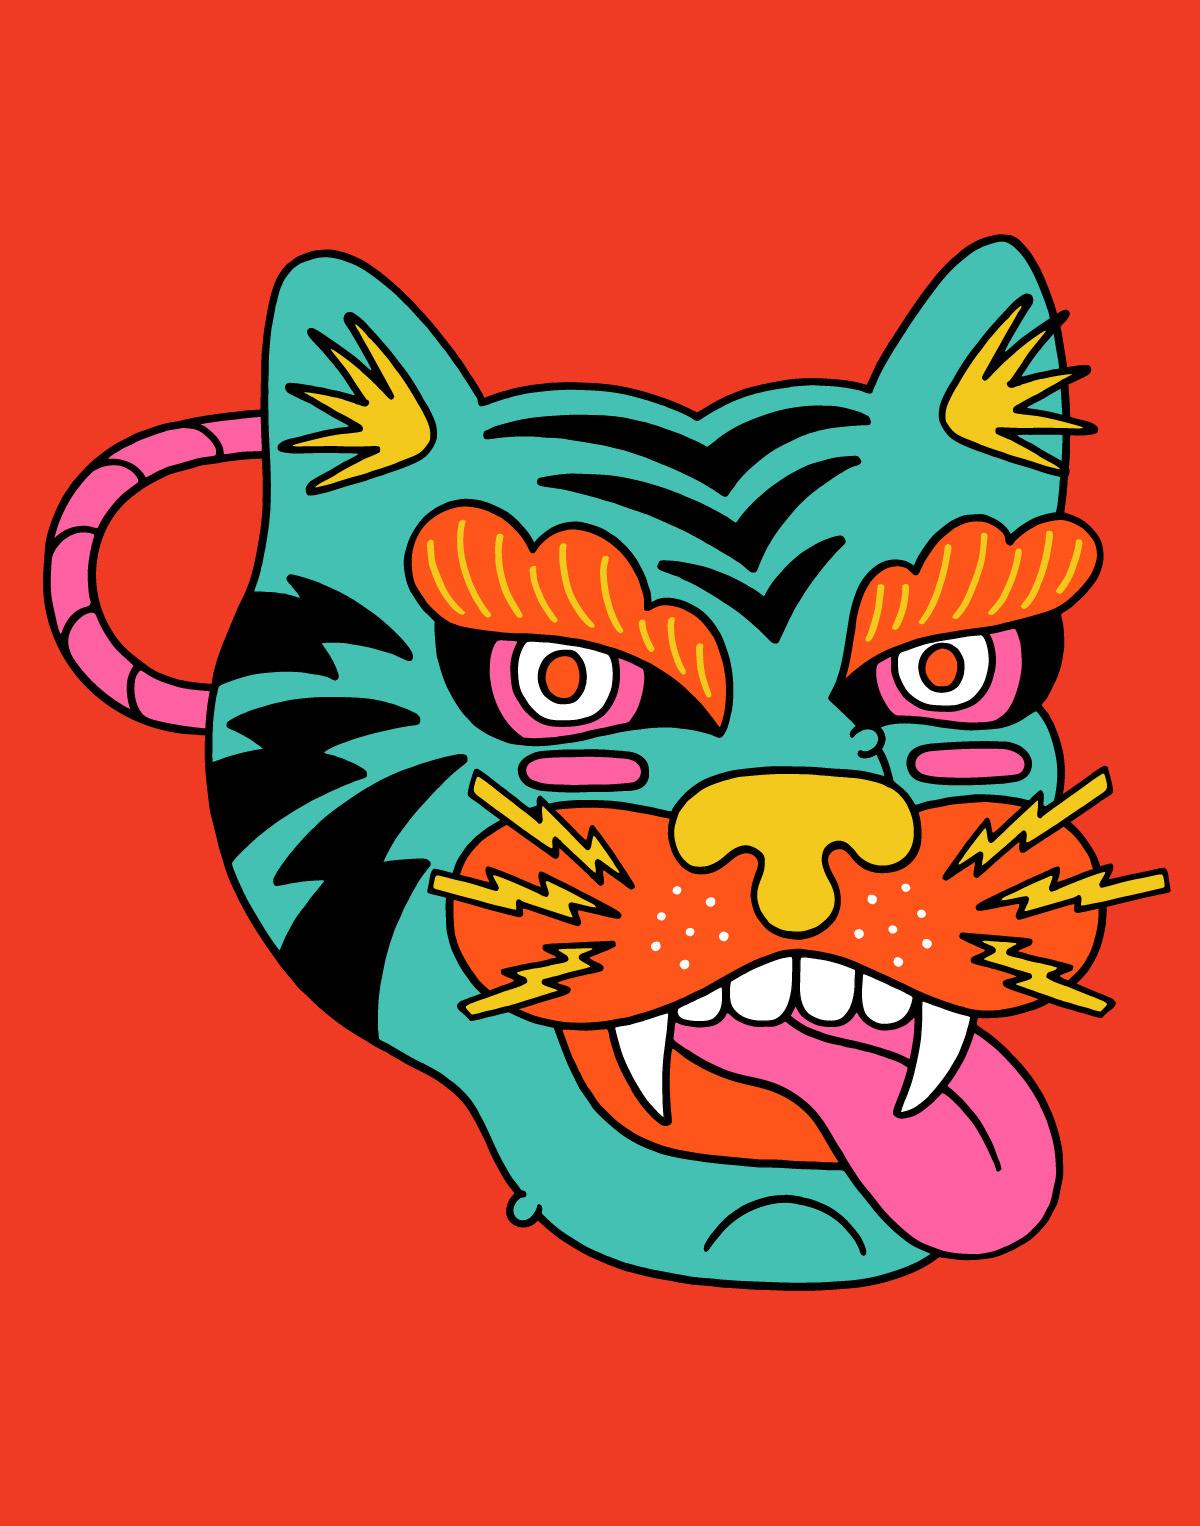 Image may contain: cartoon, illustration and animal